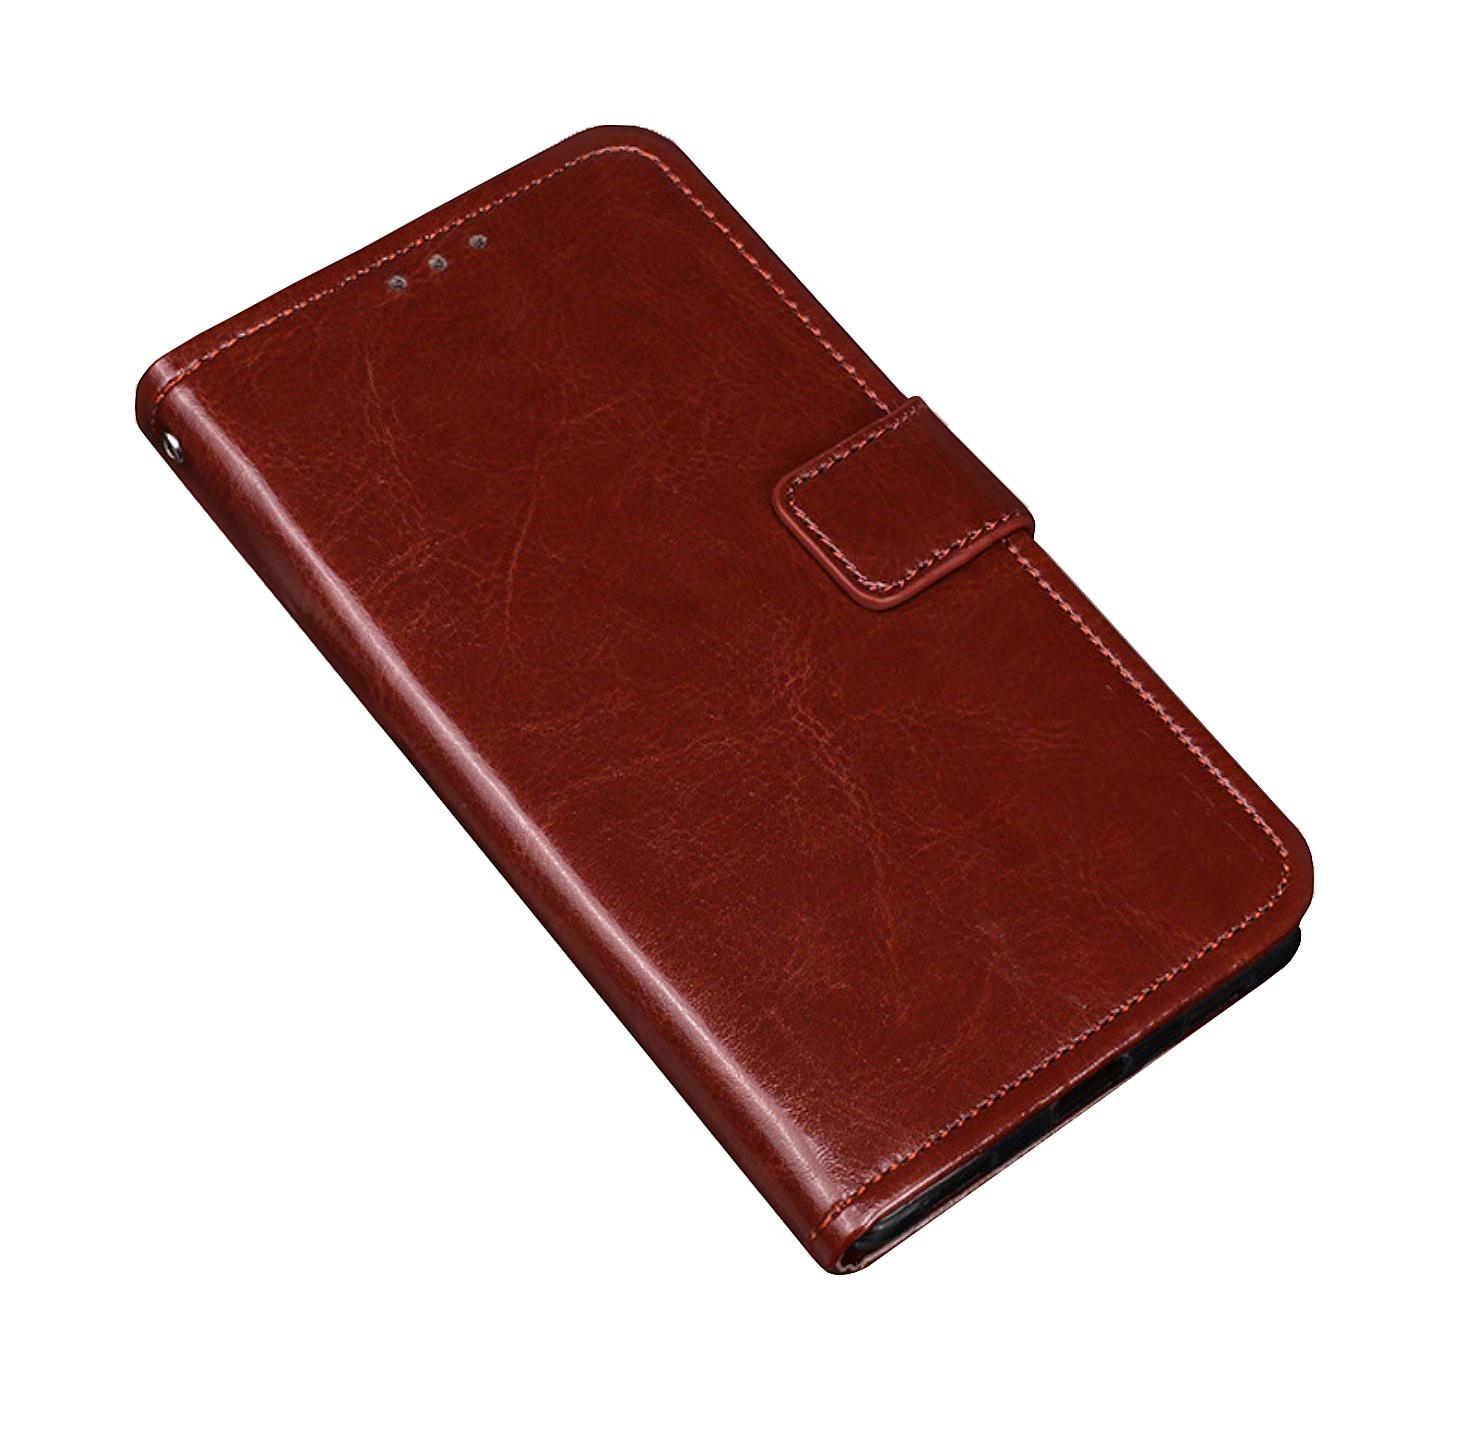 "Чехол-книжка MyPads для Sony Xperia XA / XA Dual 5.0"" (F3113/ F3112 / F3115 /E6533) с мульти-подставкой застёжкой и визитницей коричневый"